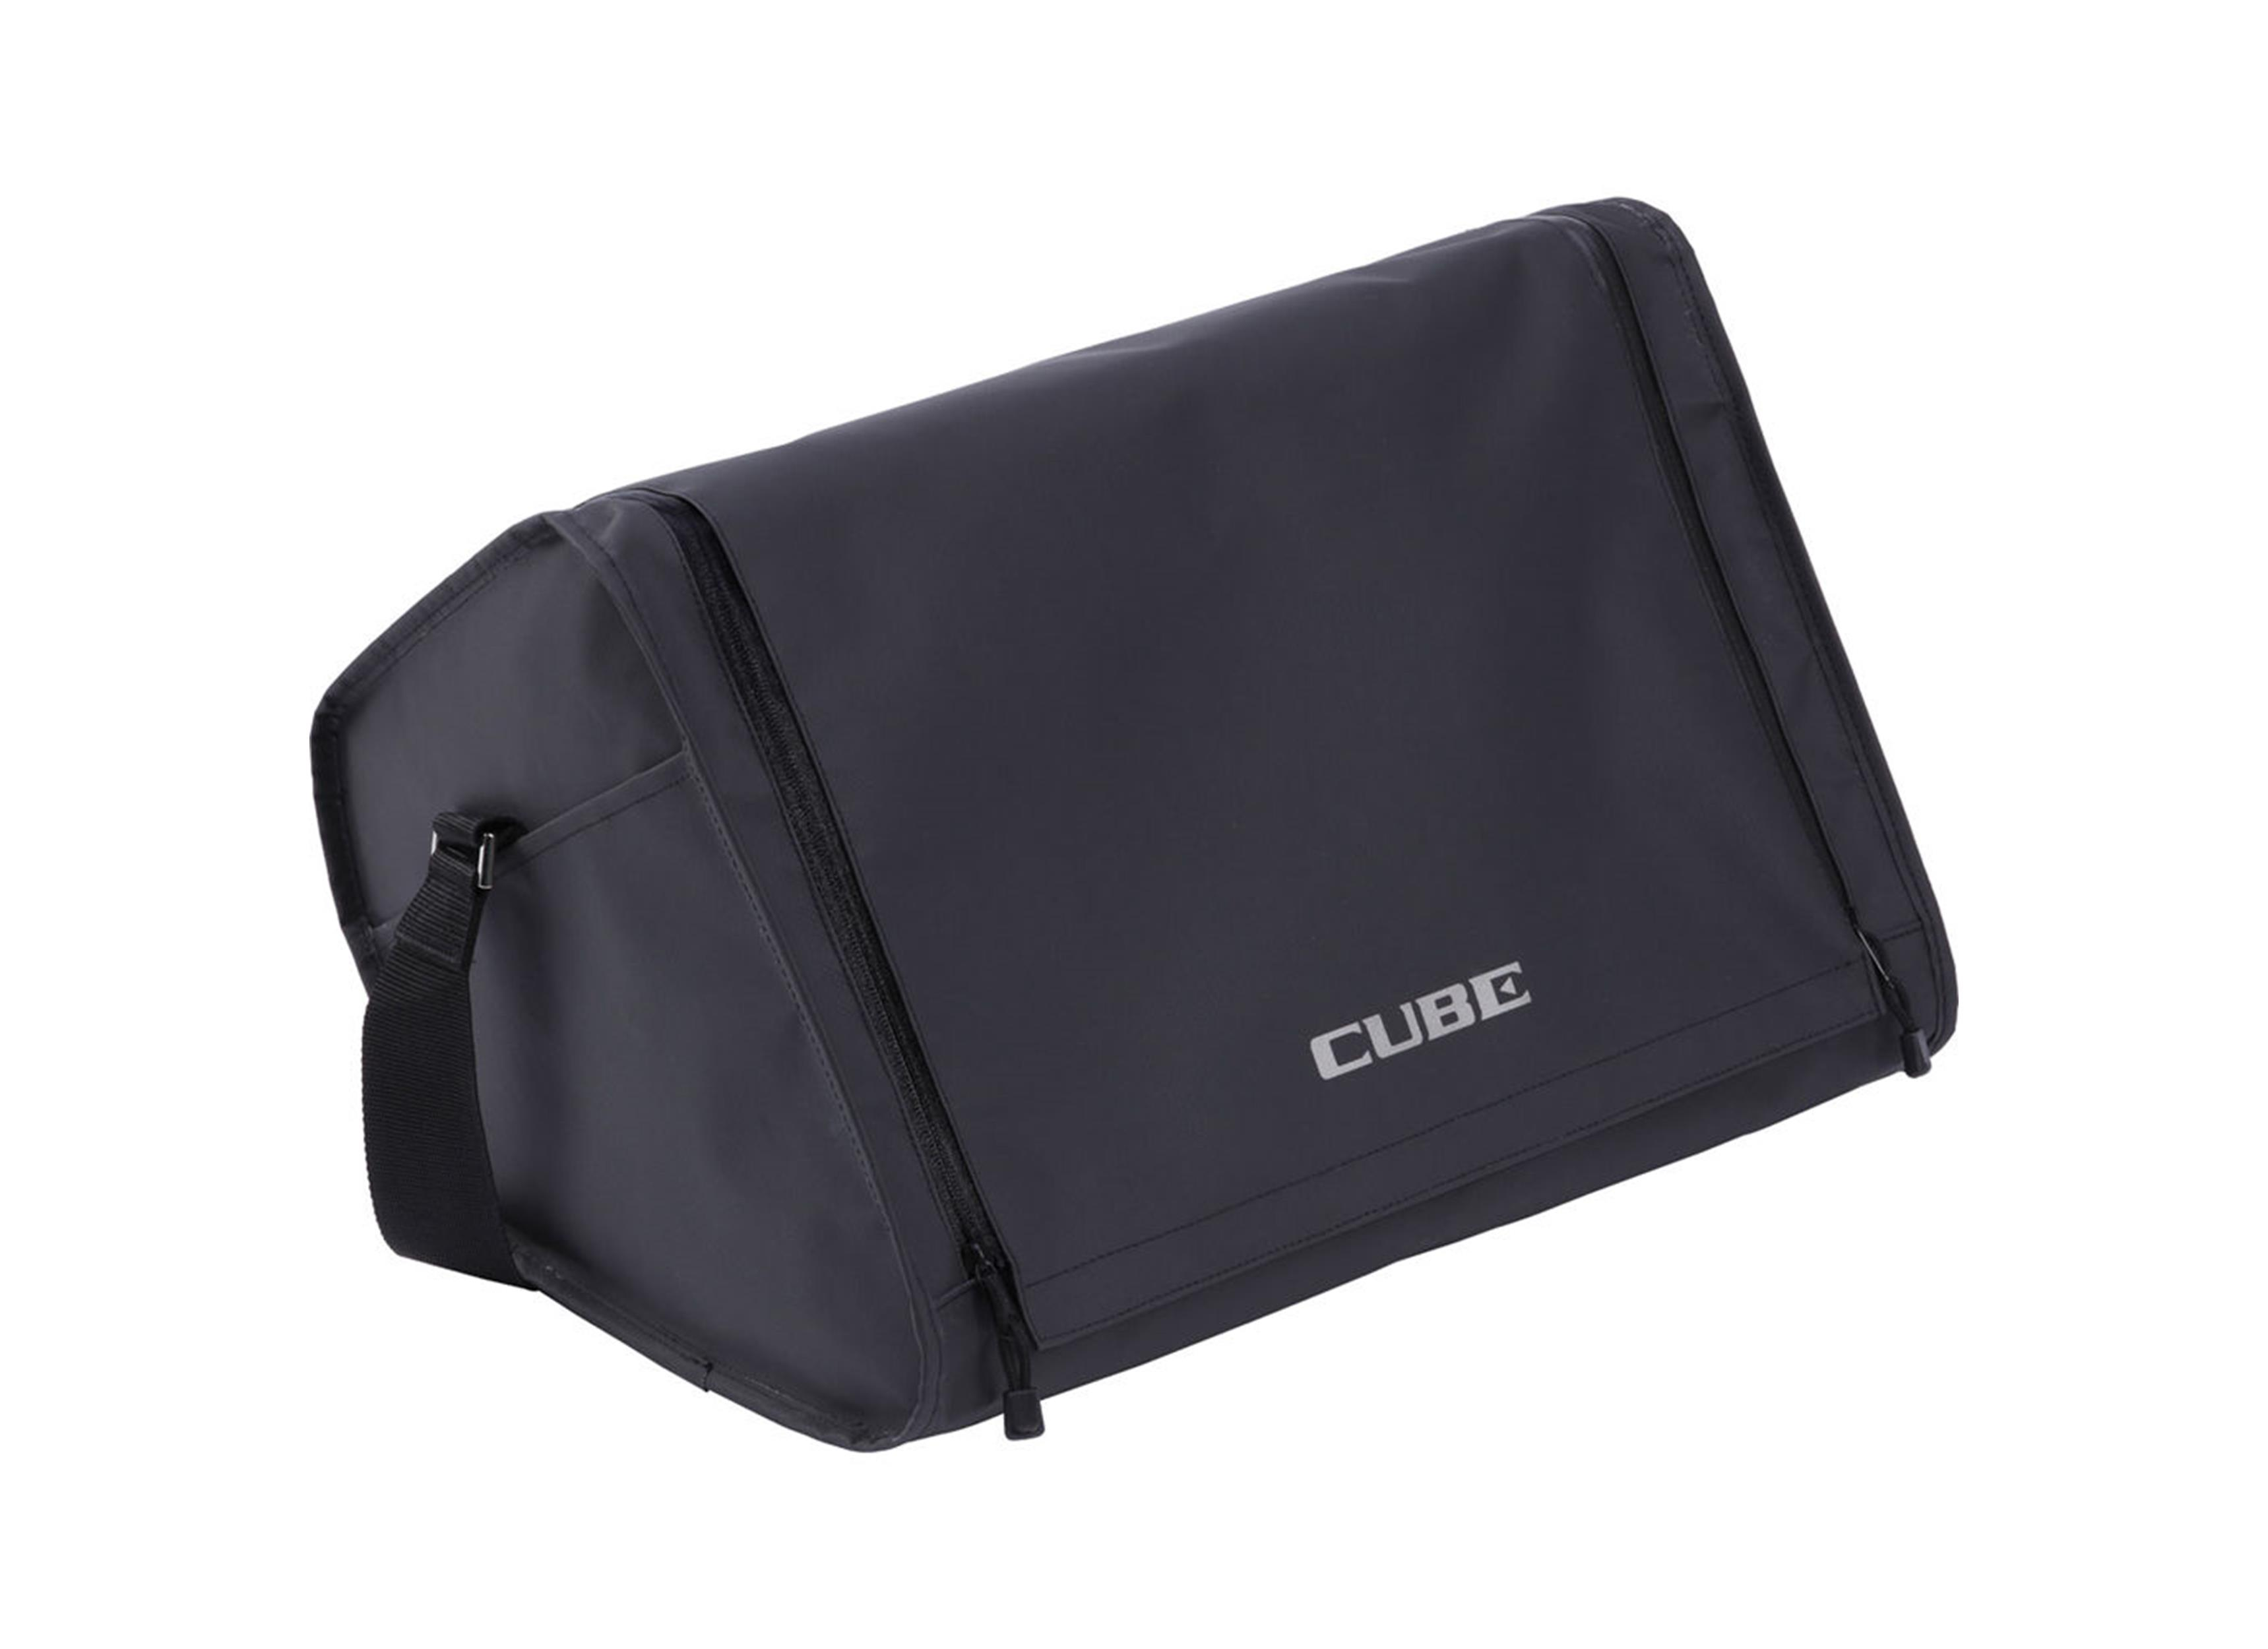 ROLAND-CB-CS-2-borsa-bag-CUBE-STREET-EX-sku-21761